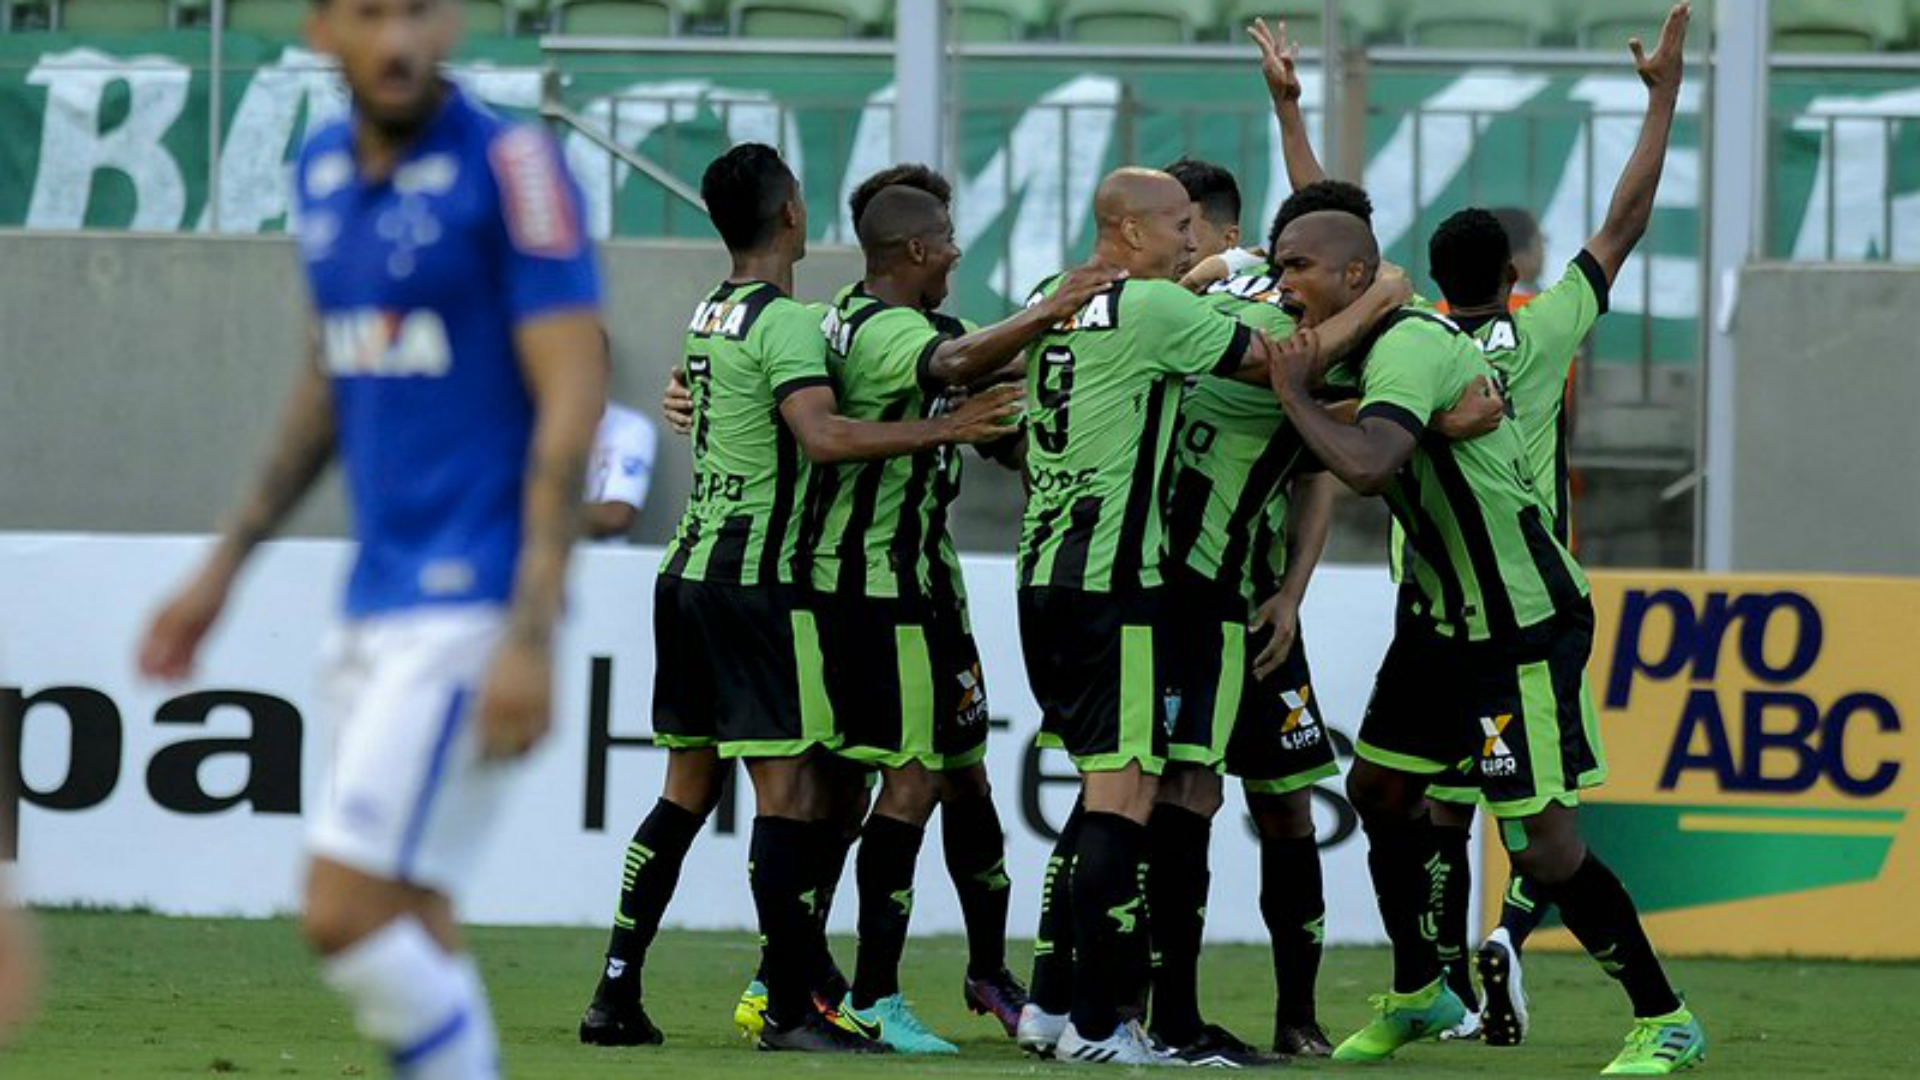 América-MG Cruzeiro Campeonato Mineiro 16042017